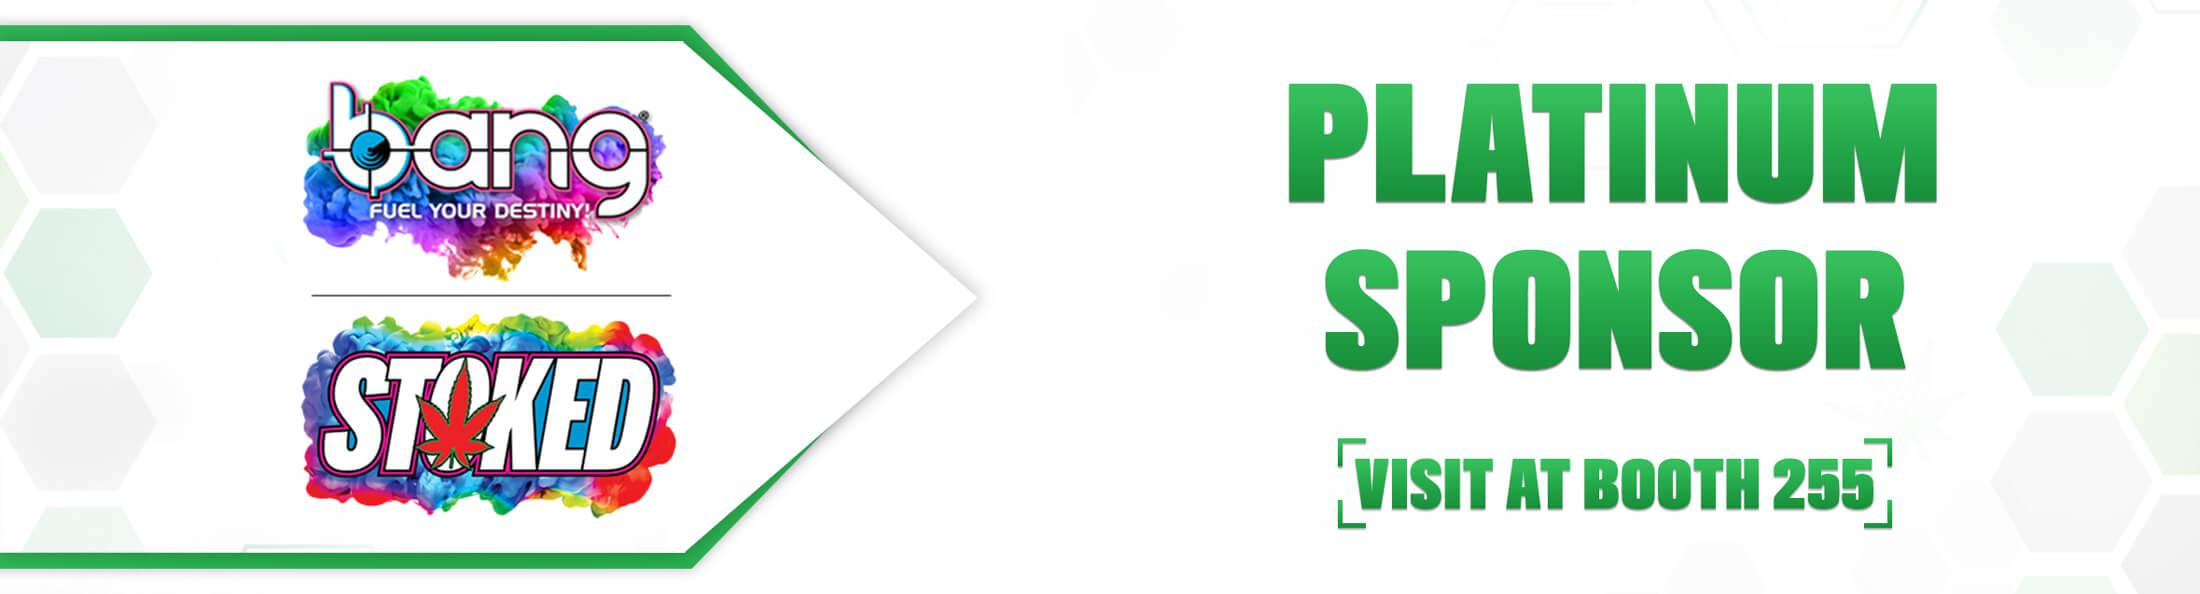 sponsor-showcase---usacbdexpo-lasvegas-bangenergy-platinumsponsor (1).jpg